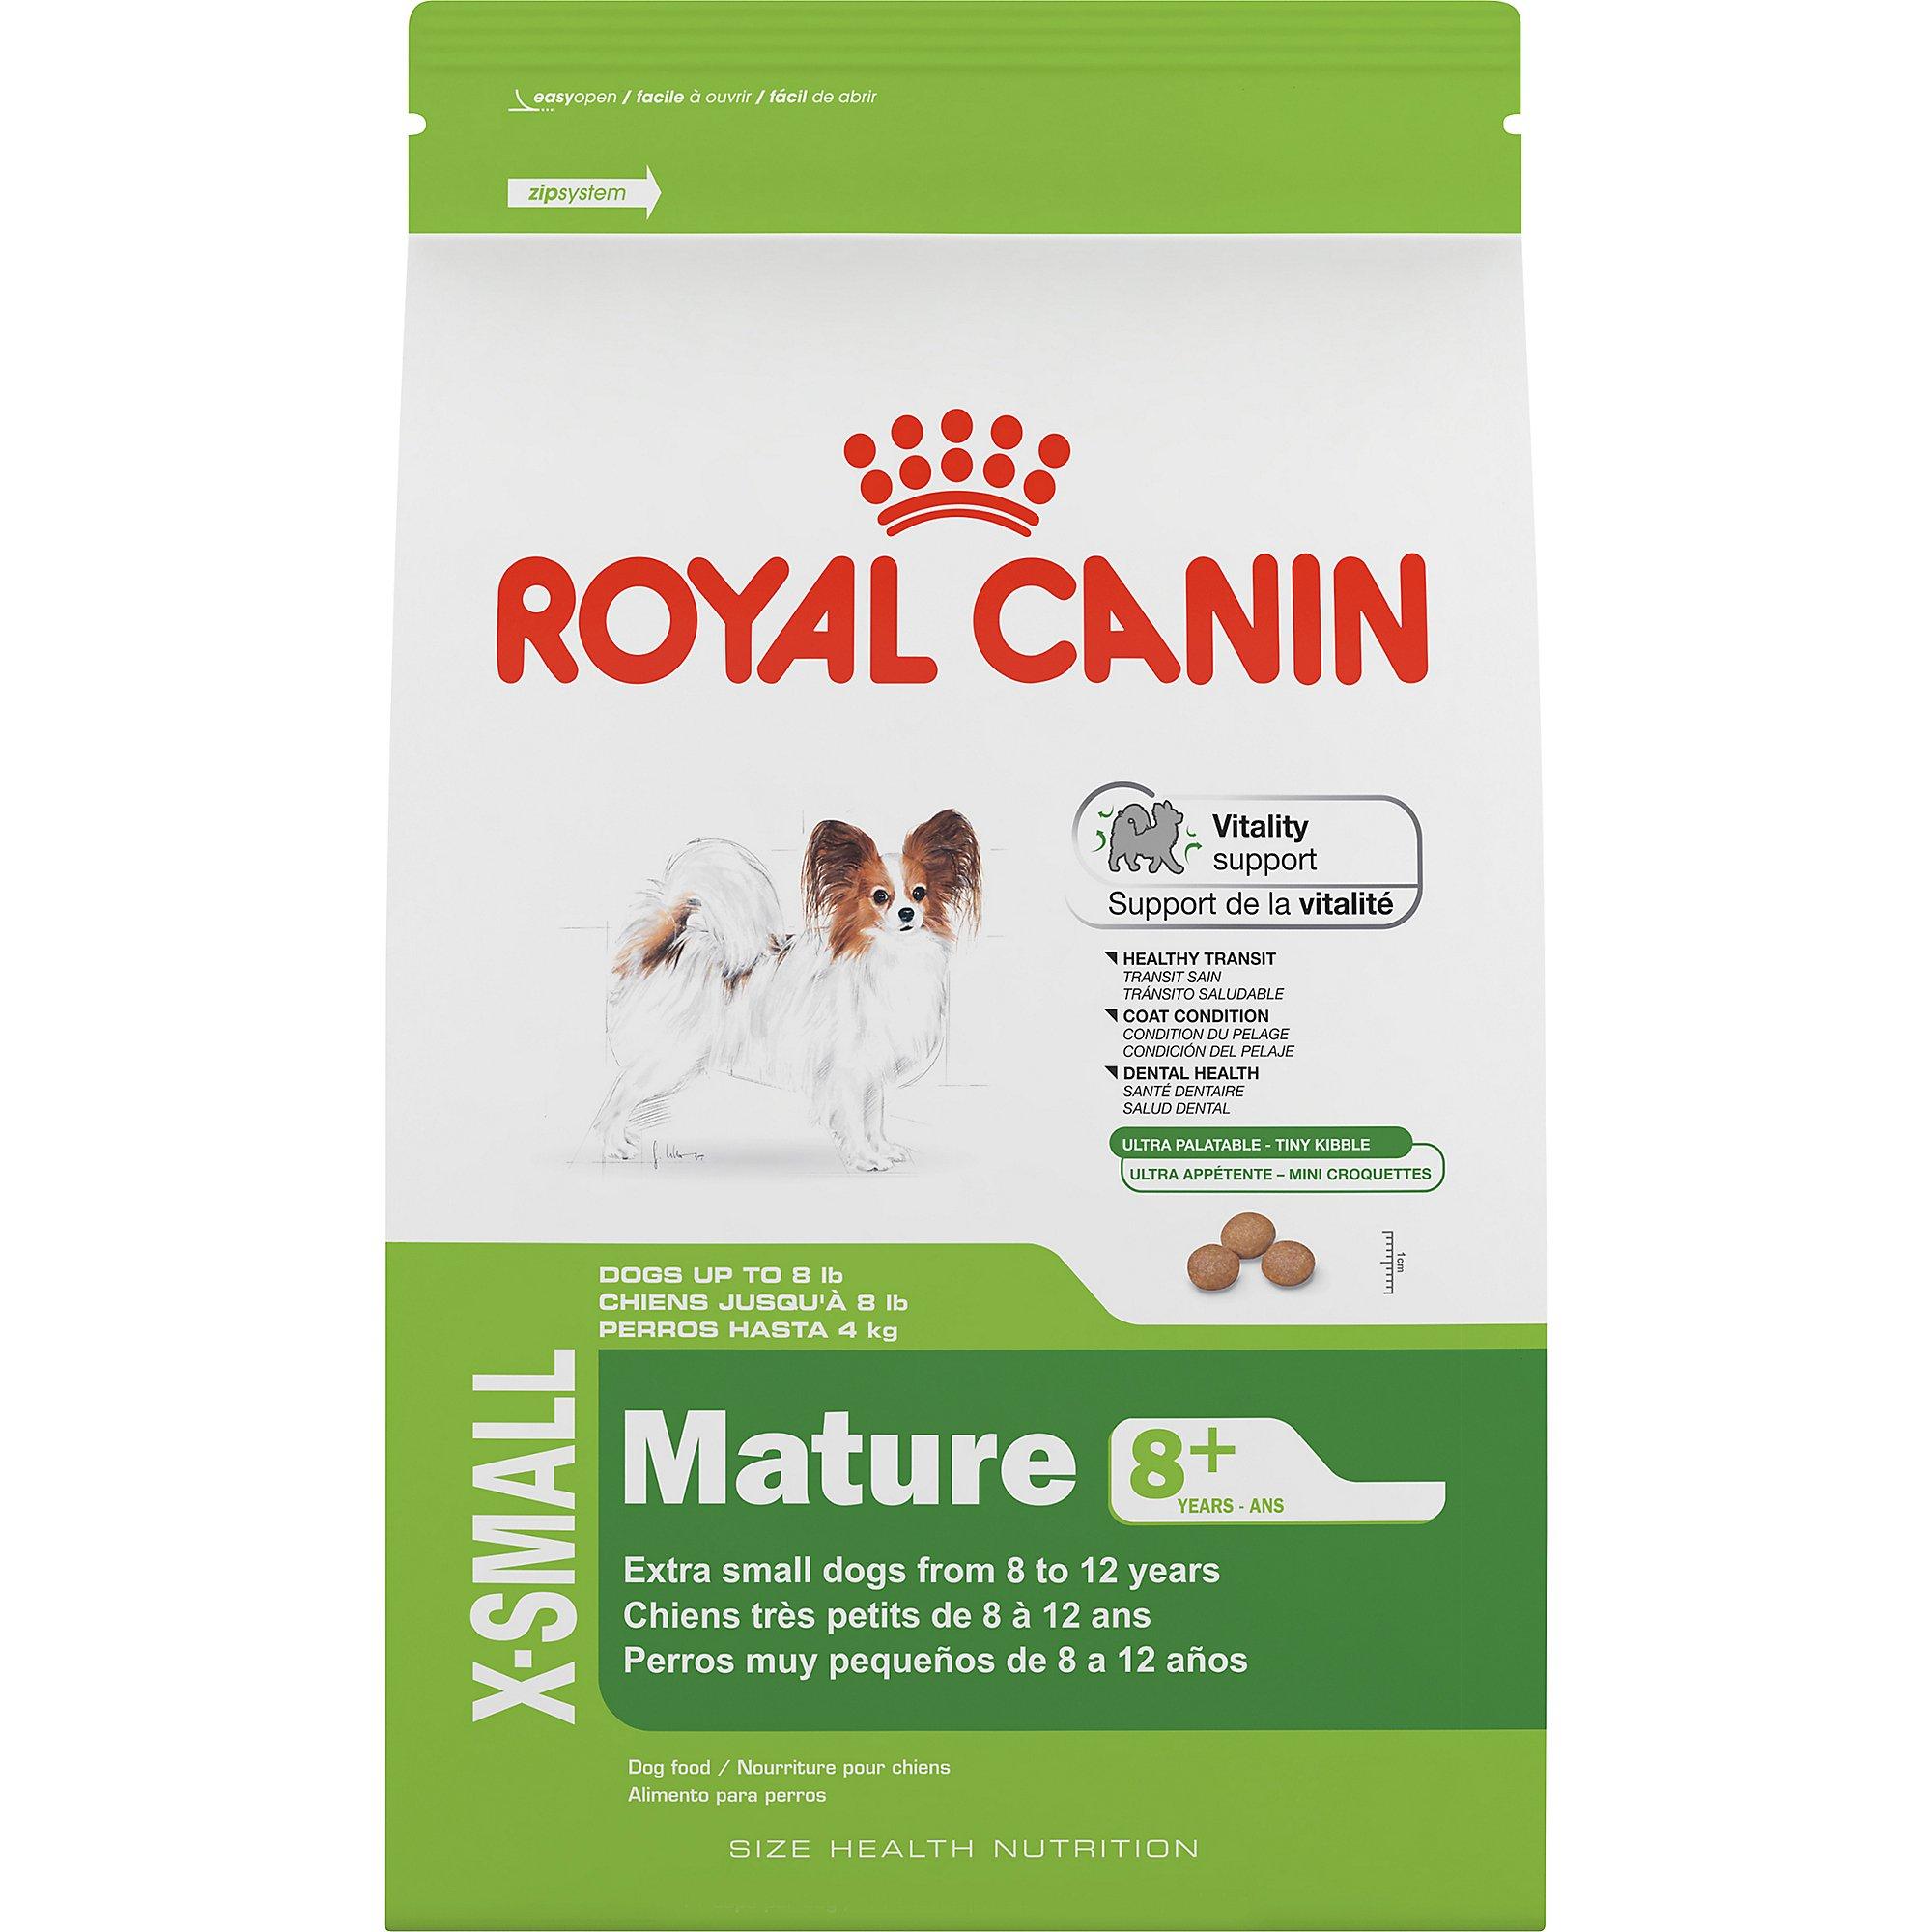 Royal Canin Small Dog Food